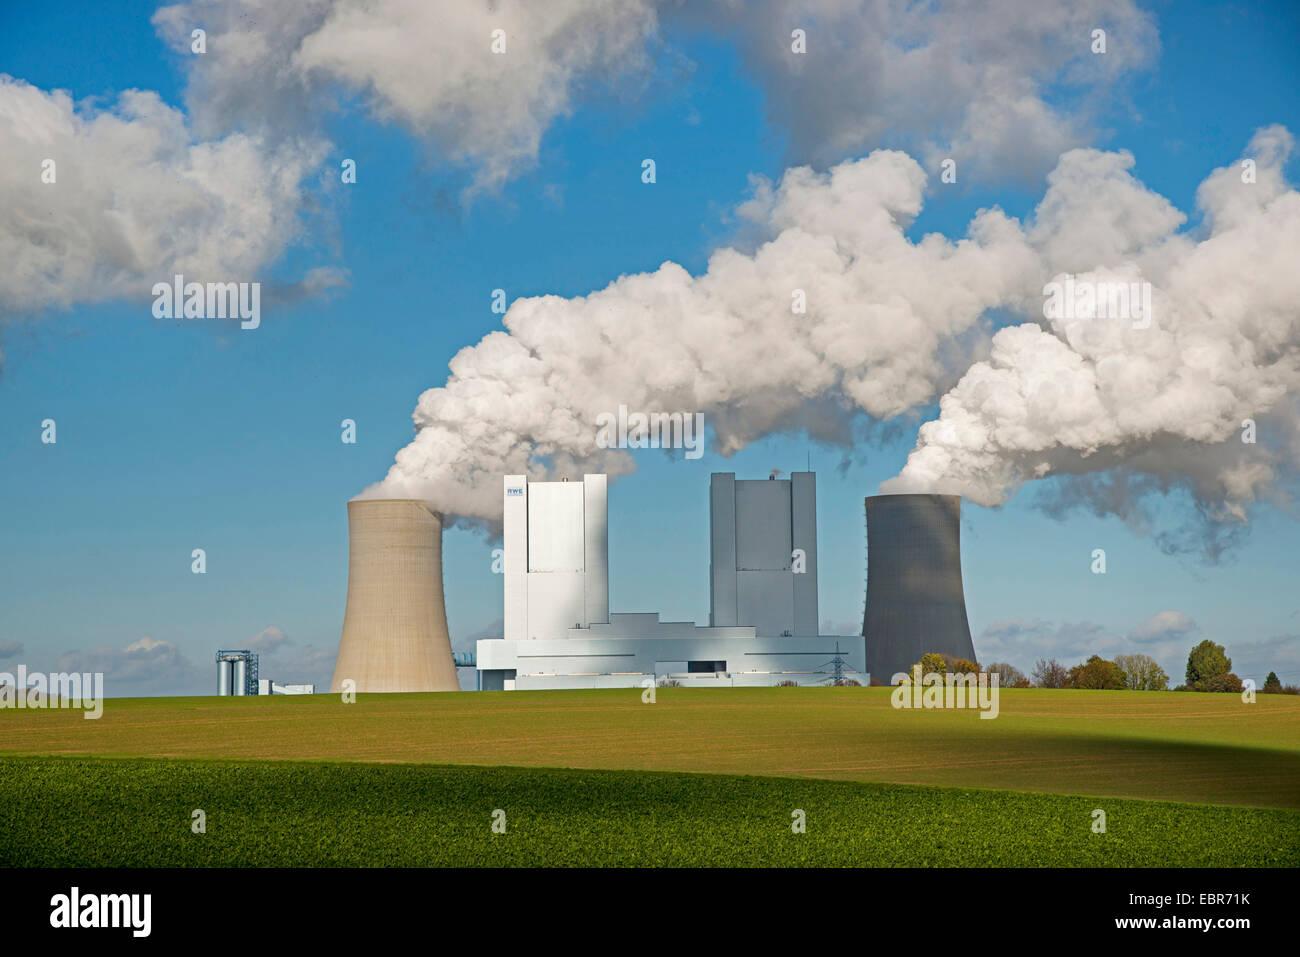 brown coal-fired power station RWE-Power in Grevenbroich-Neurath, Germany, North Rhine-Westphalia, Grevenbroich - Stock Image